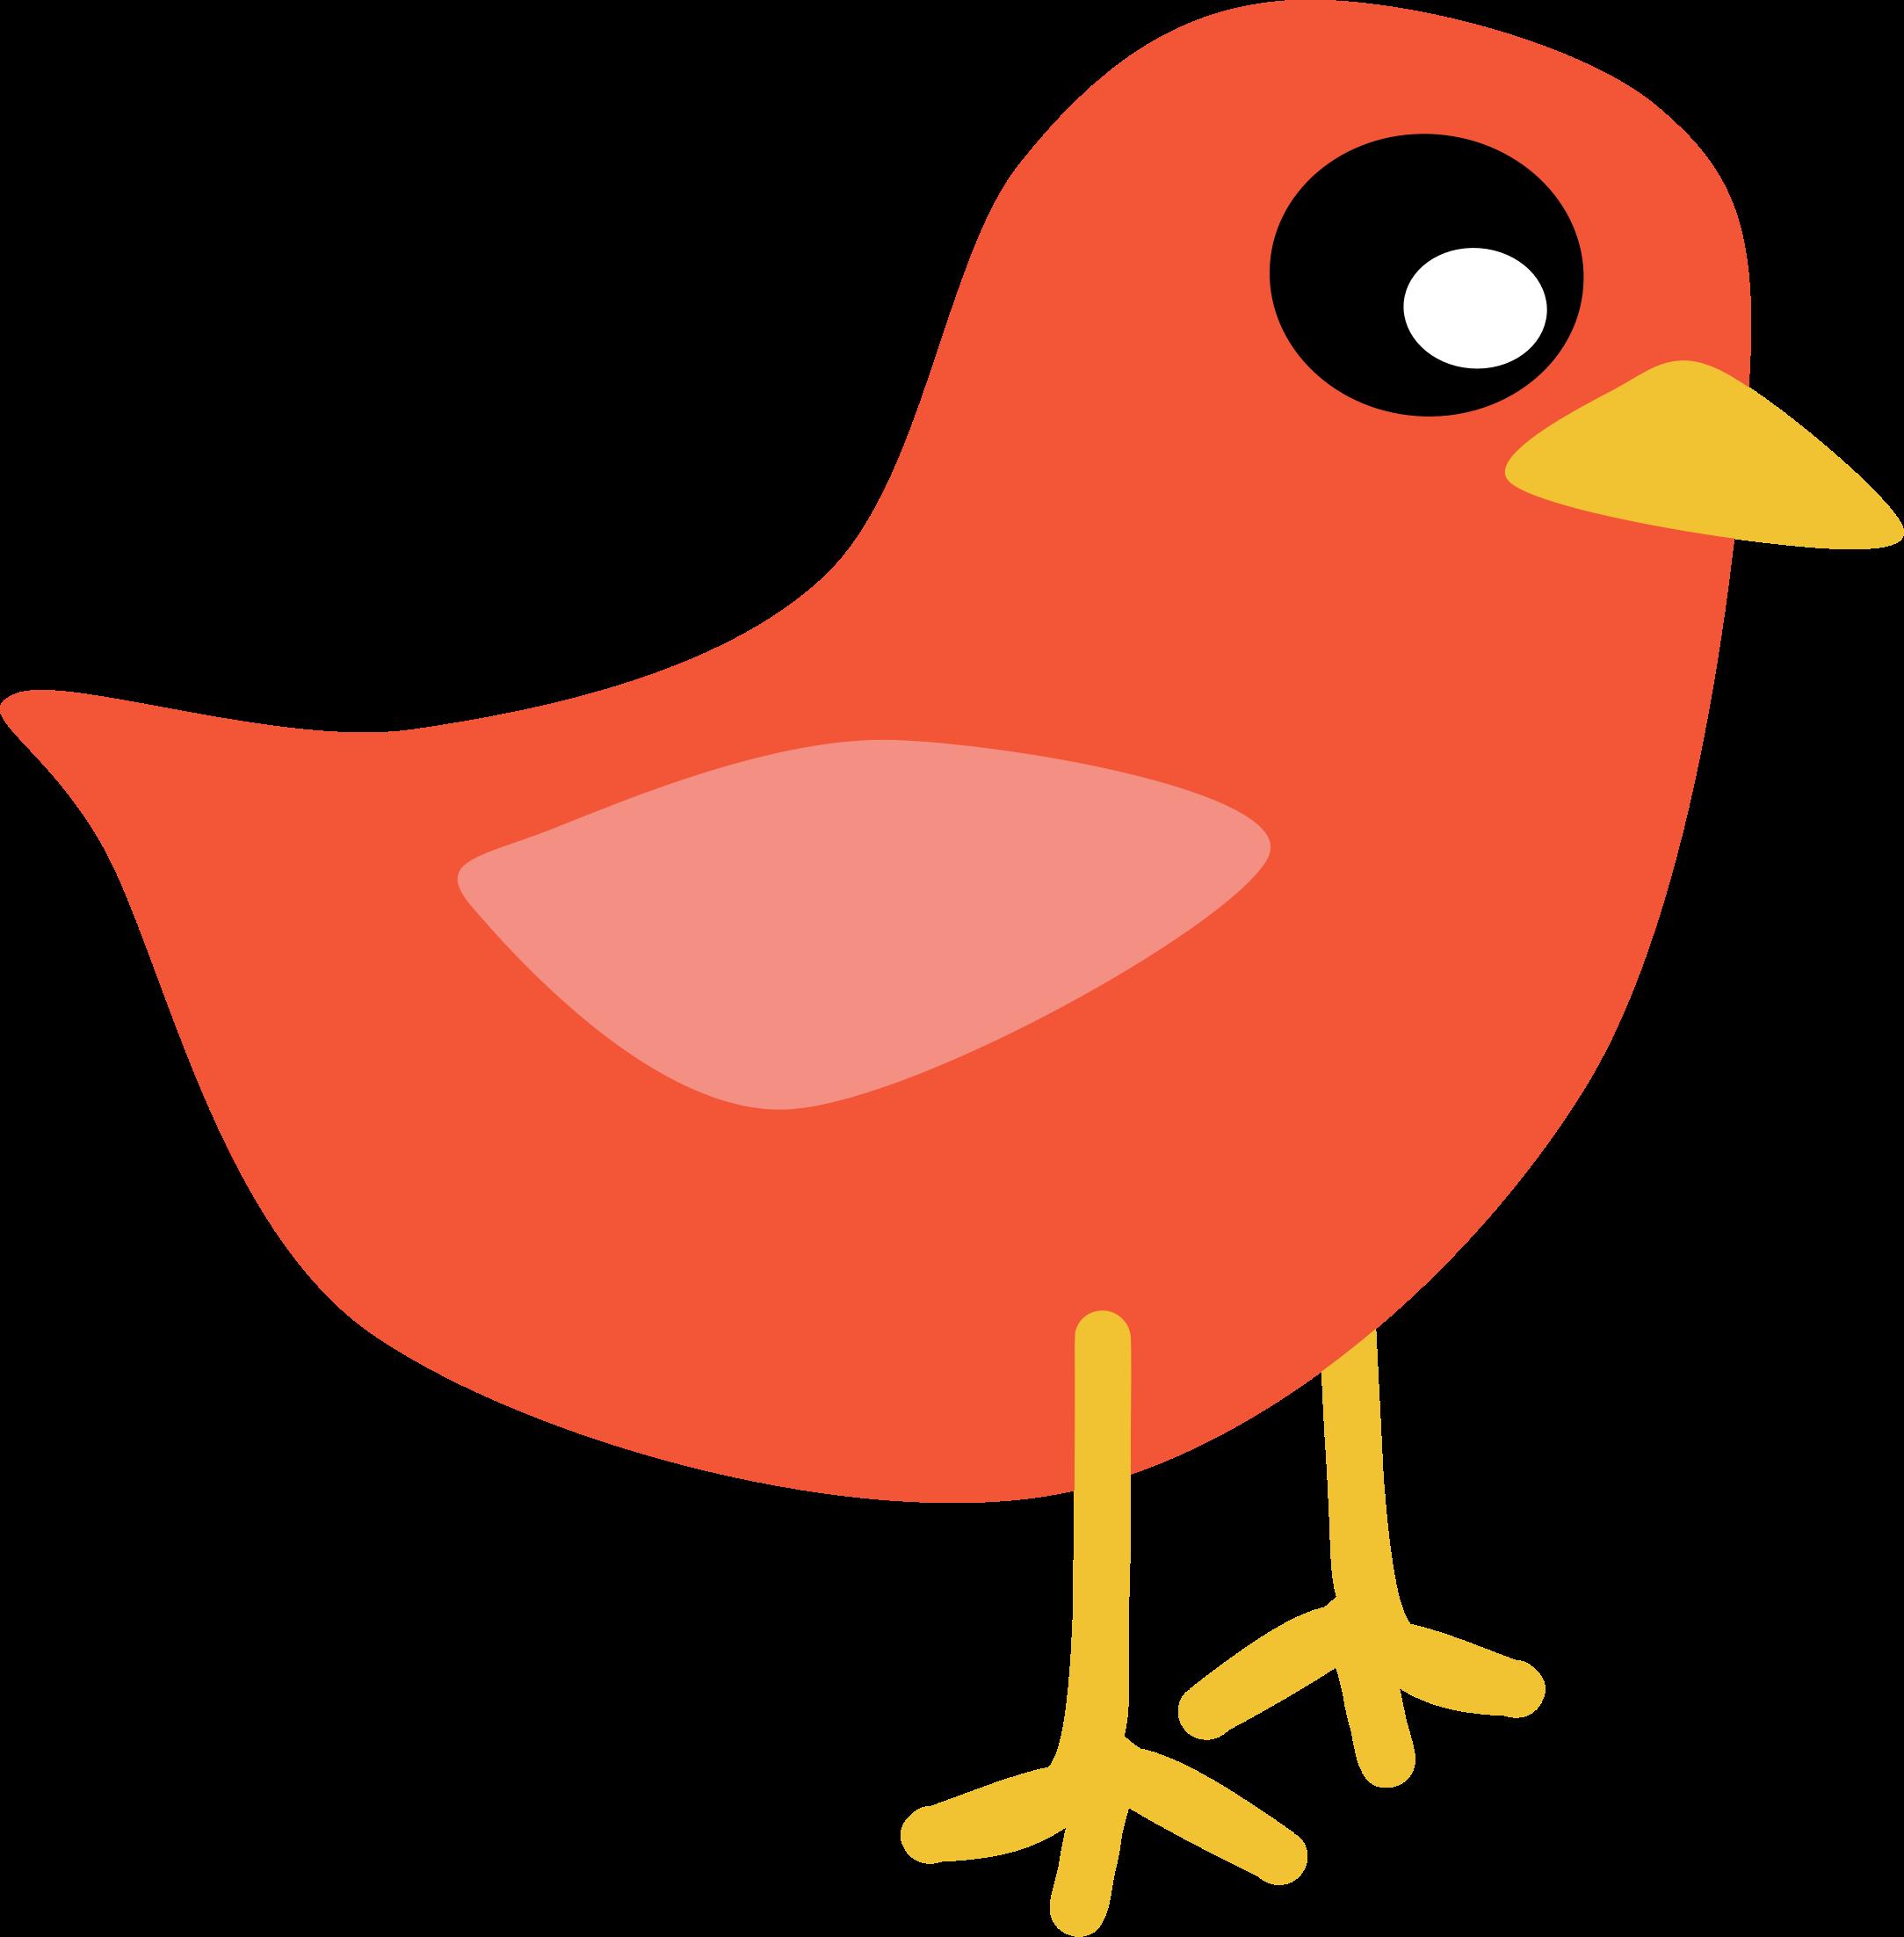 Clipart Birds Red Clip art of Bird Clipart #8727 — Clipartwork.